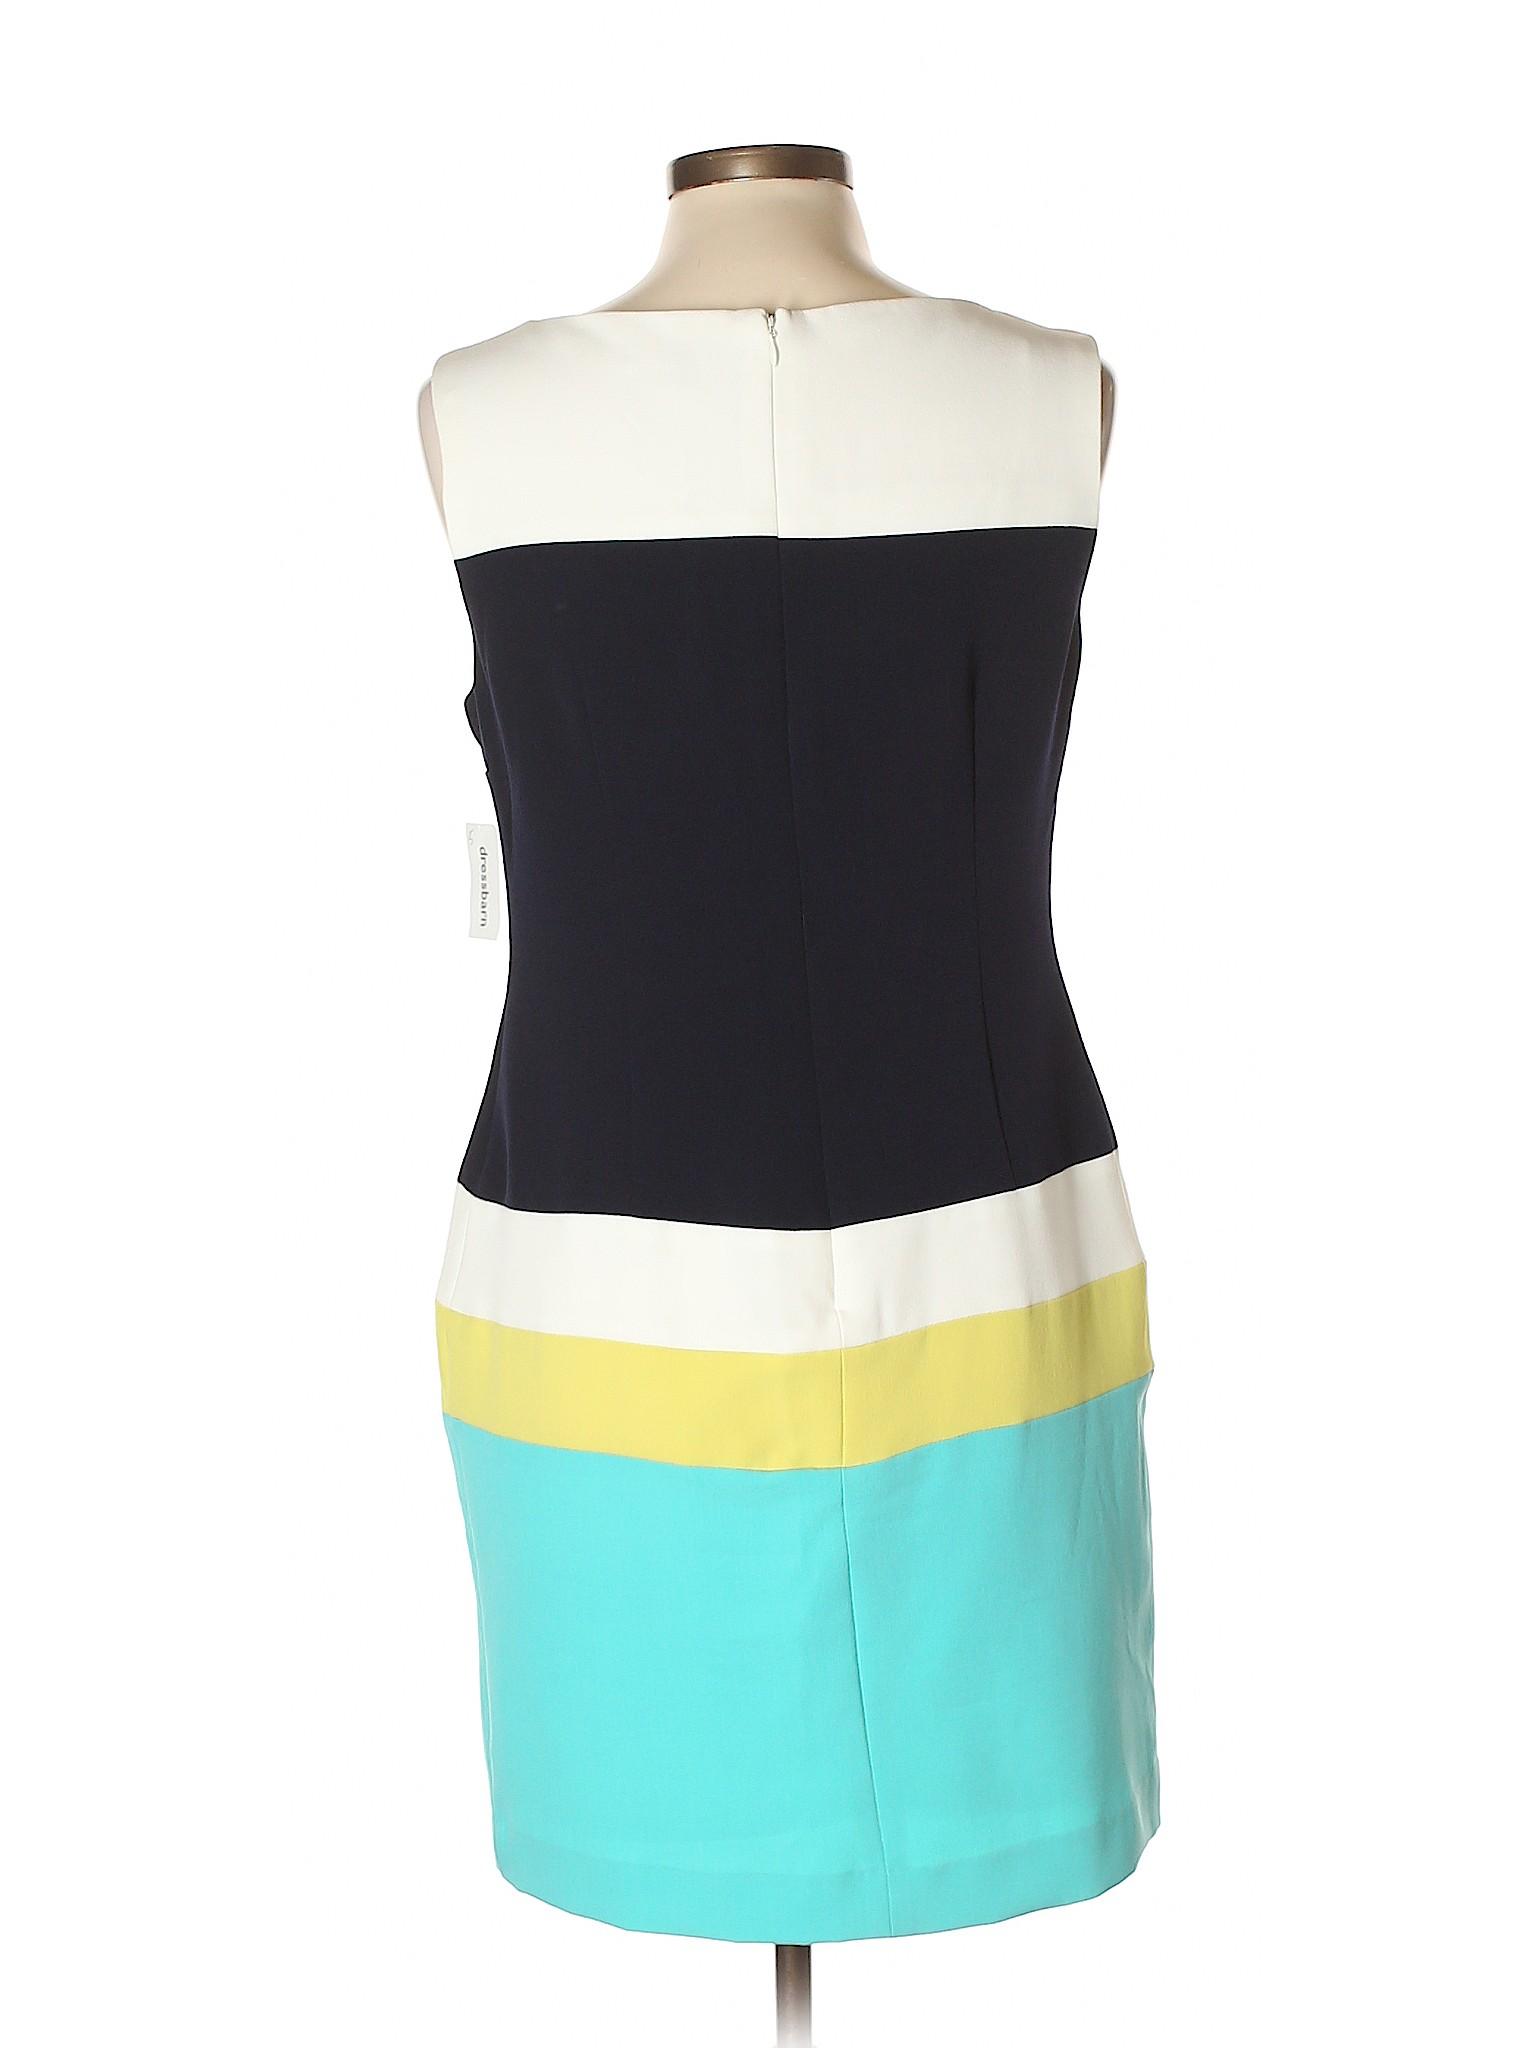 Dress winter Boutique amp; Casual Roz Ali R1w7qHw